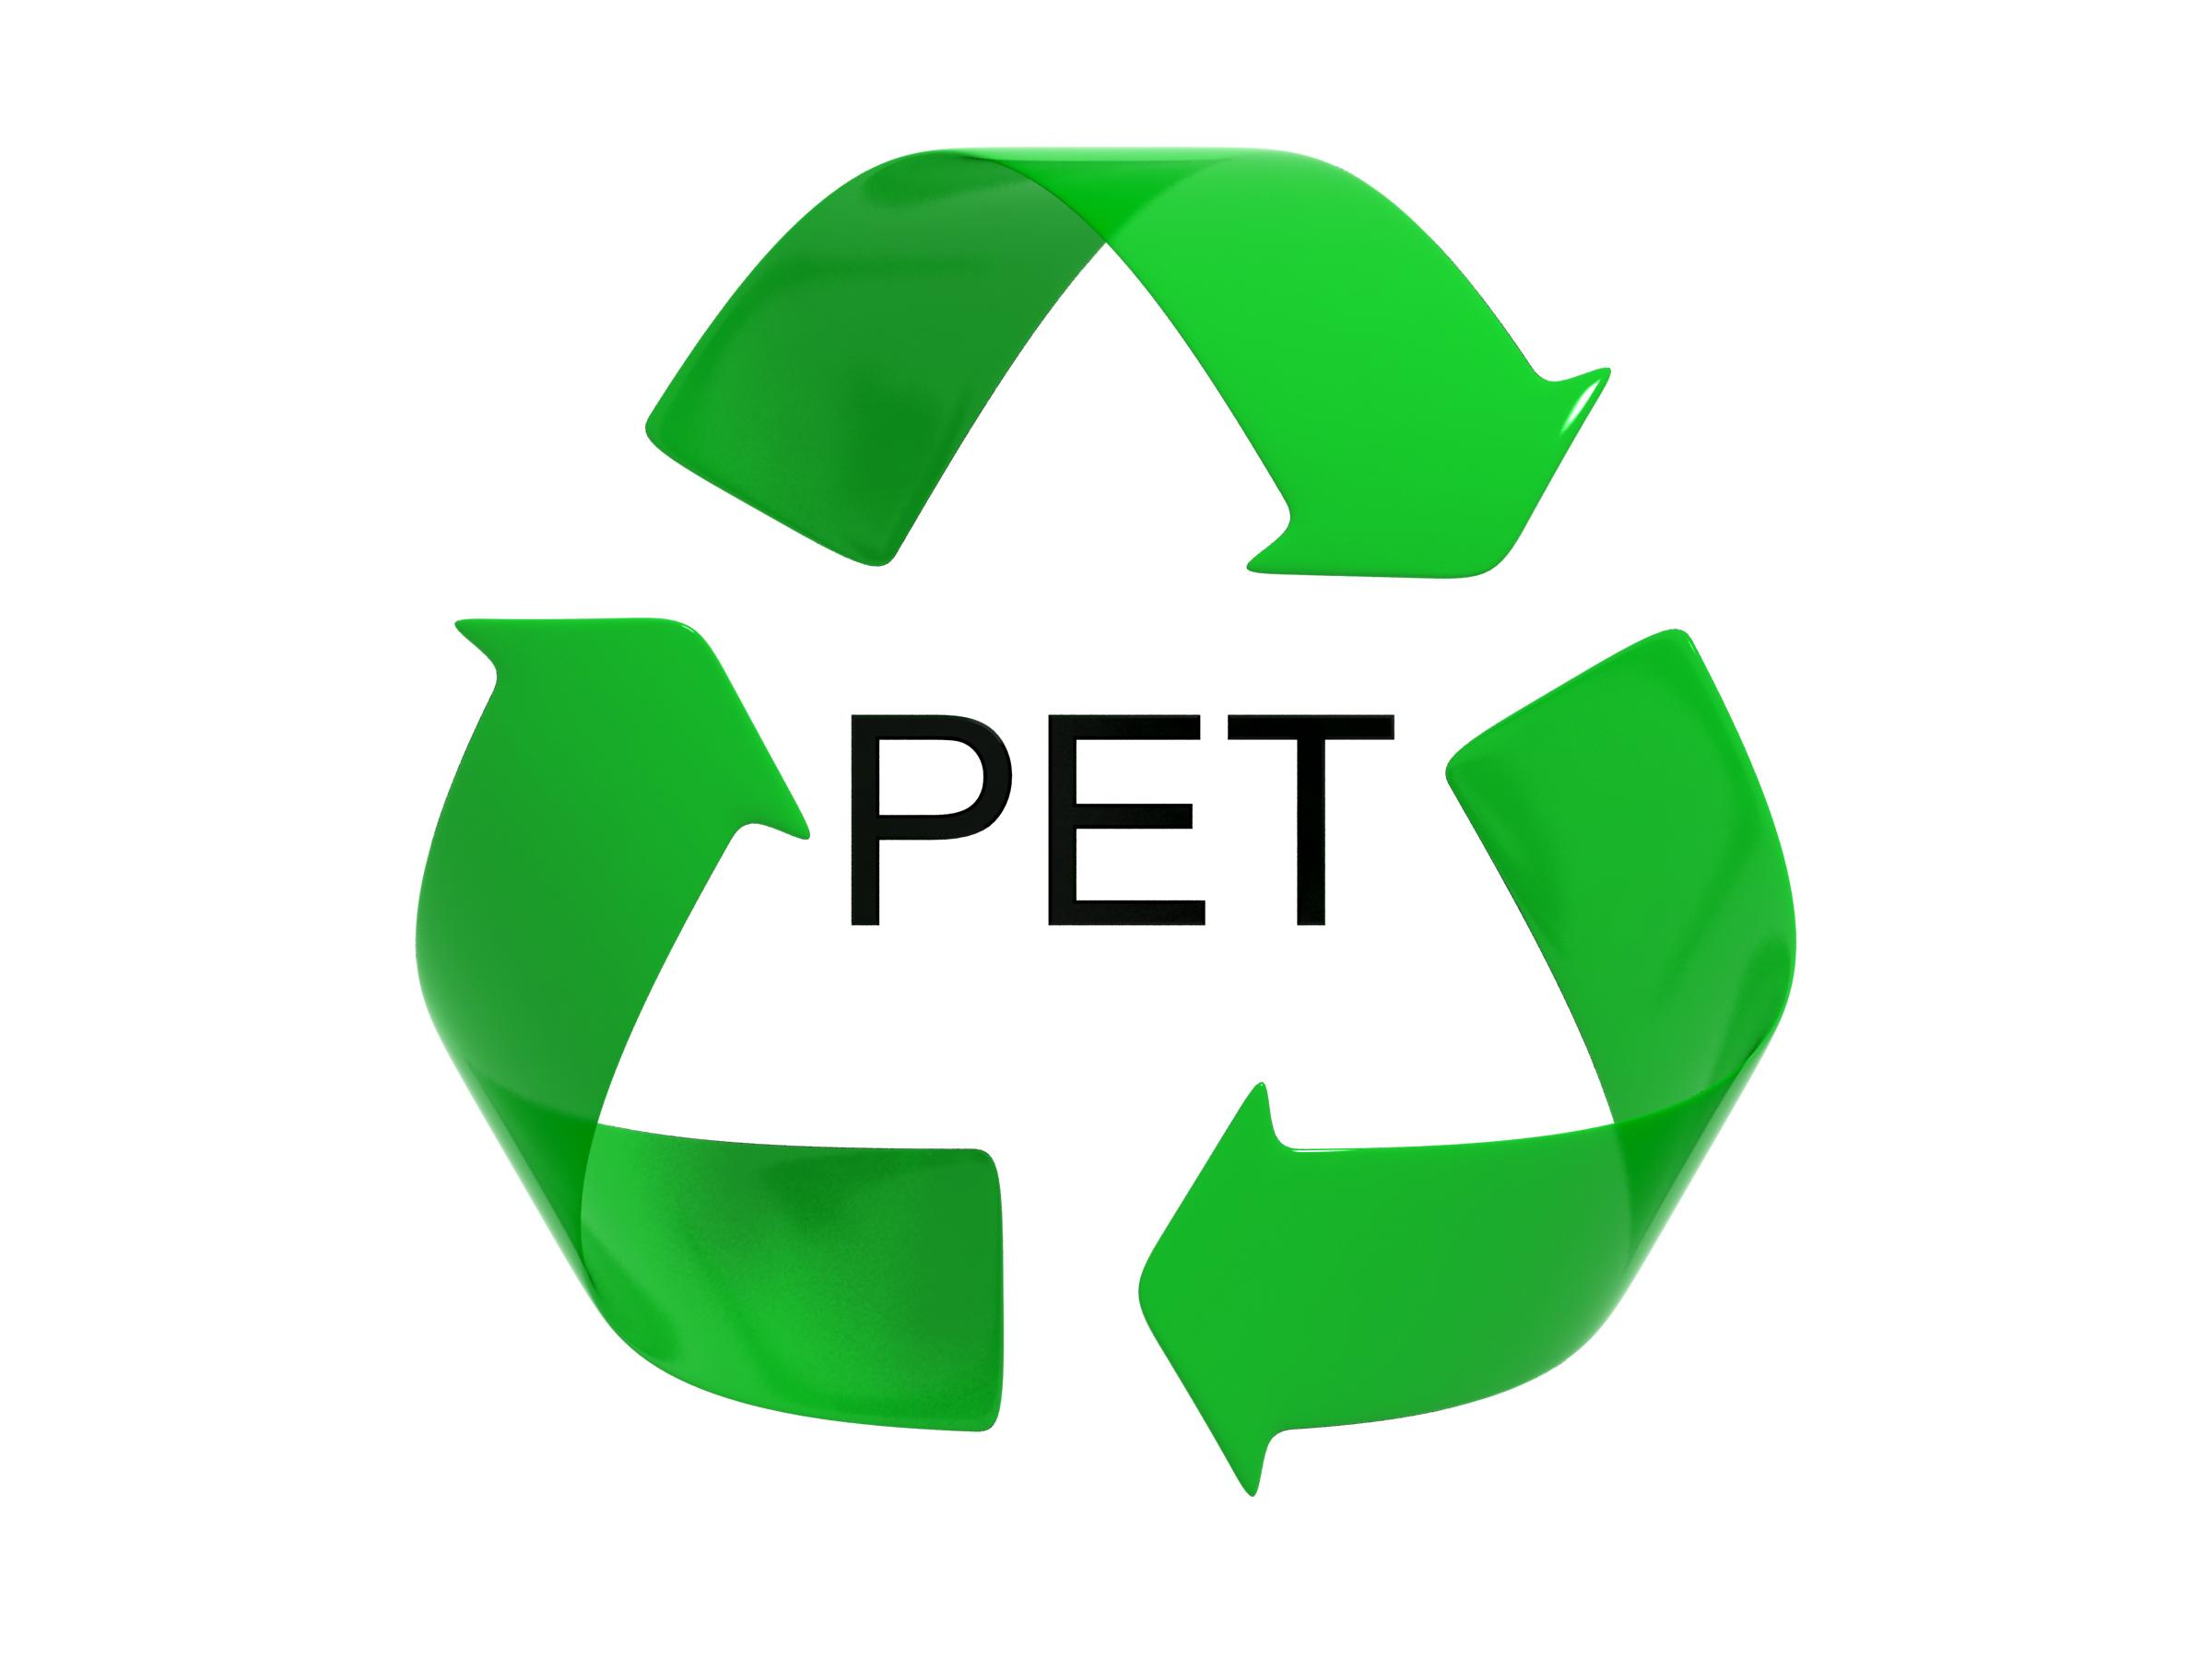 PET / digitalconsumator, Shutterstock